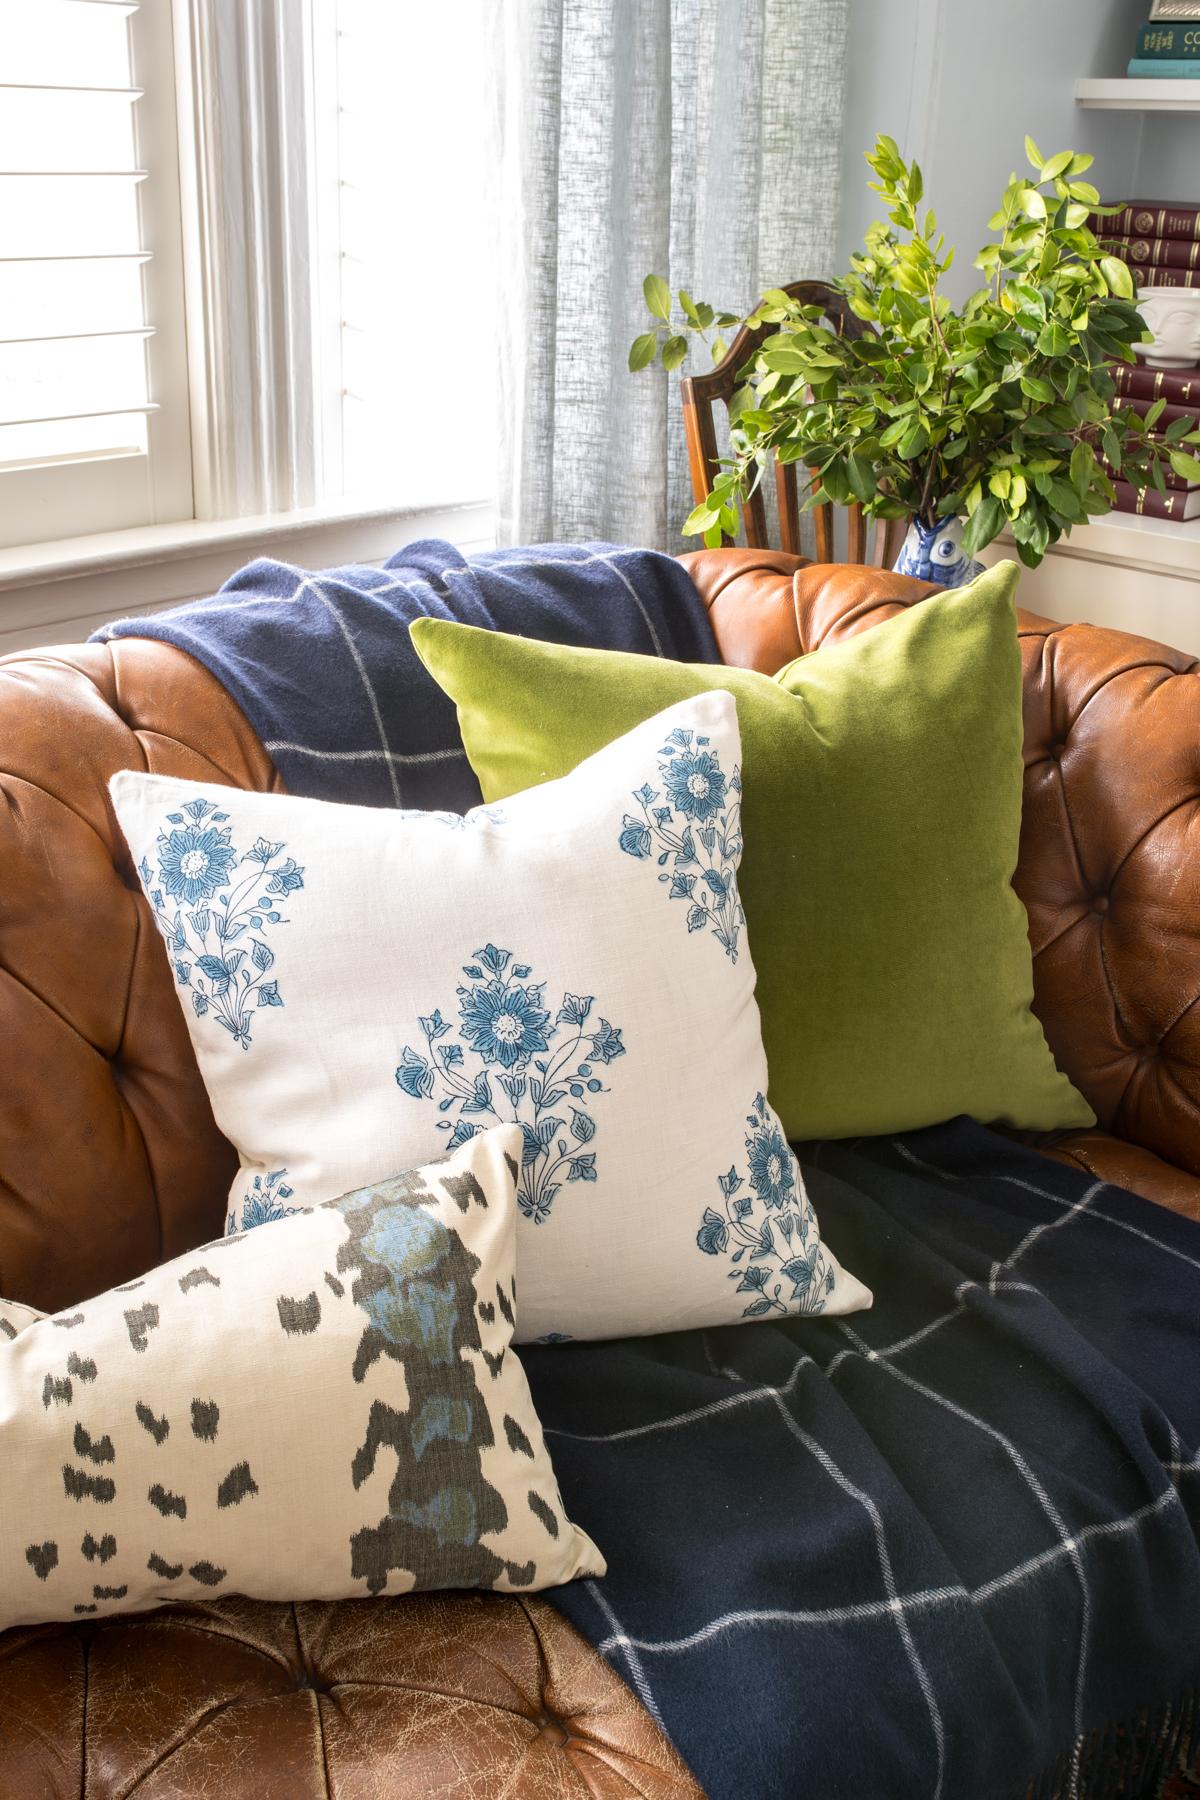 Stacie Flinner Arianna Belle Pillows-11.jpg